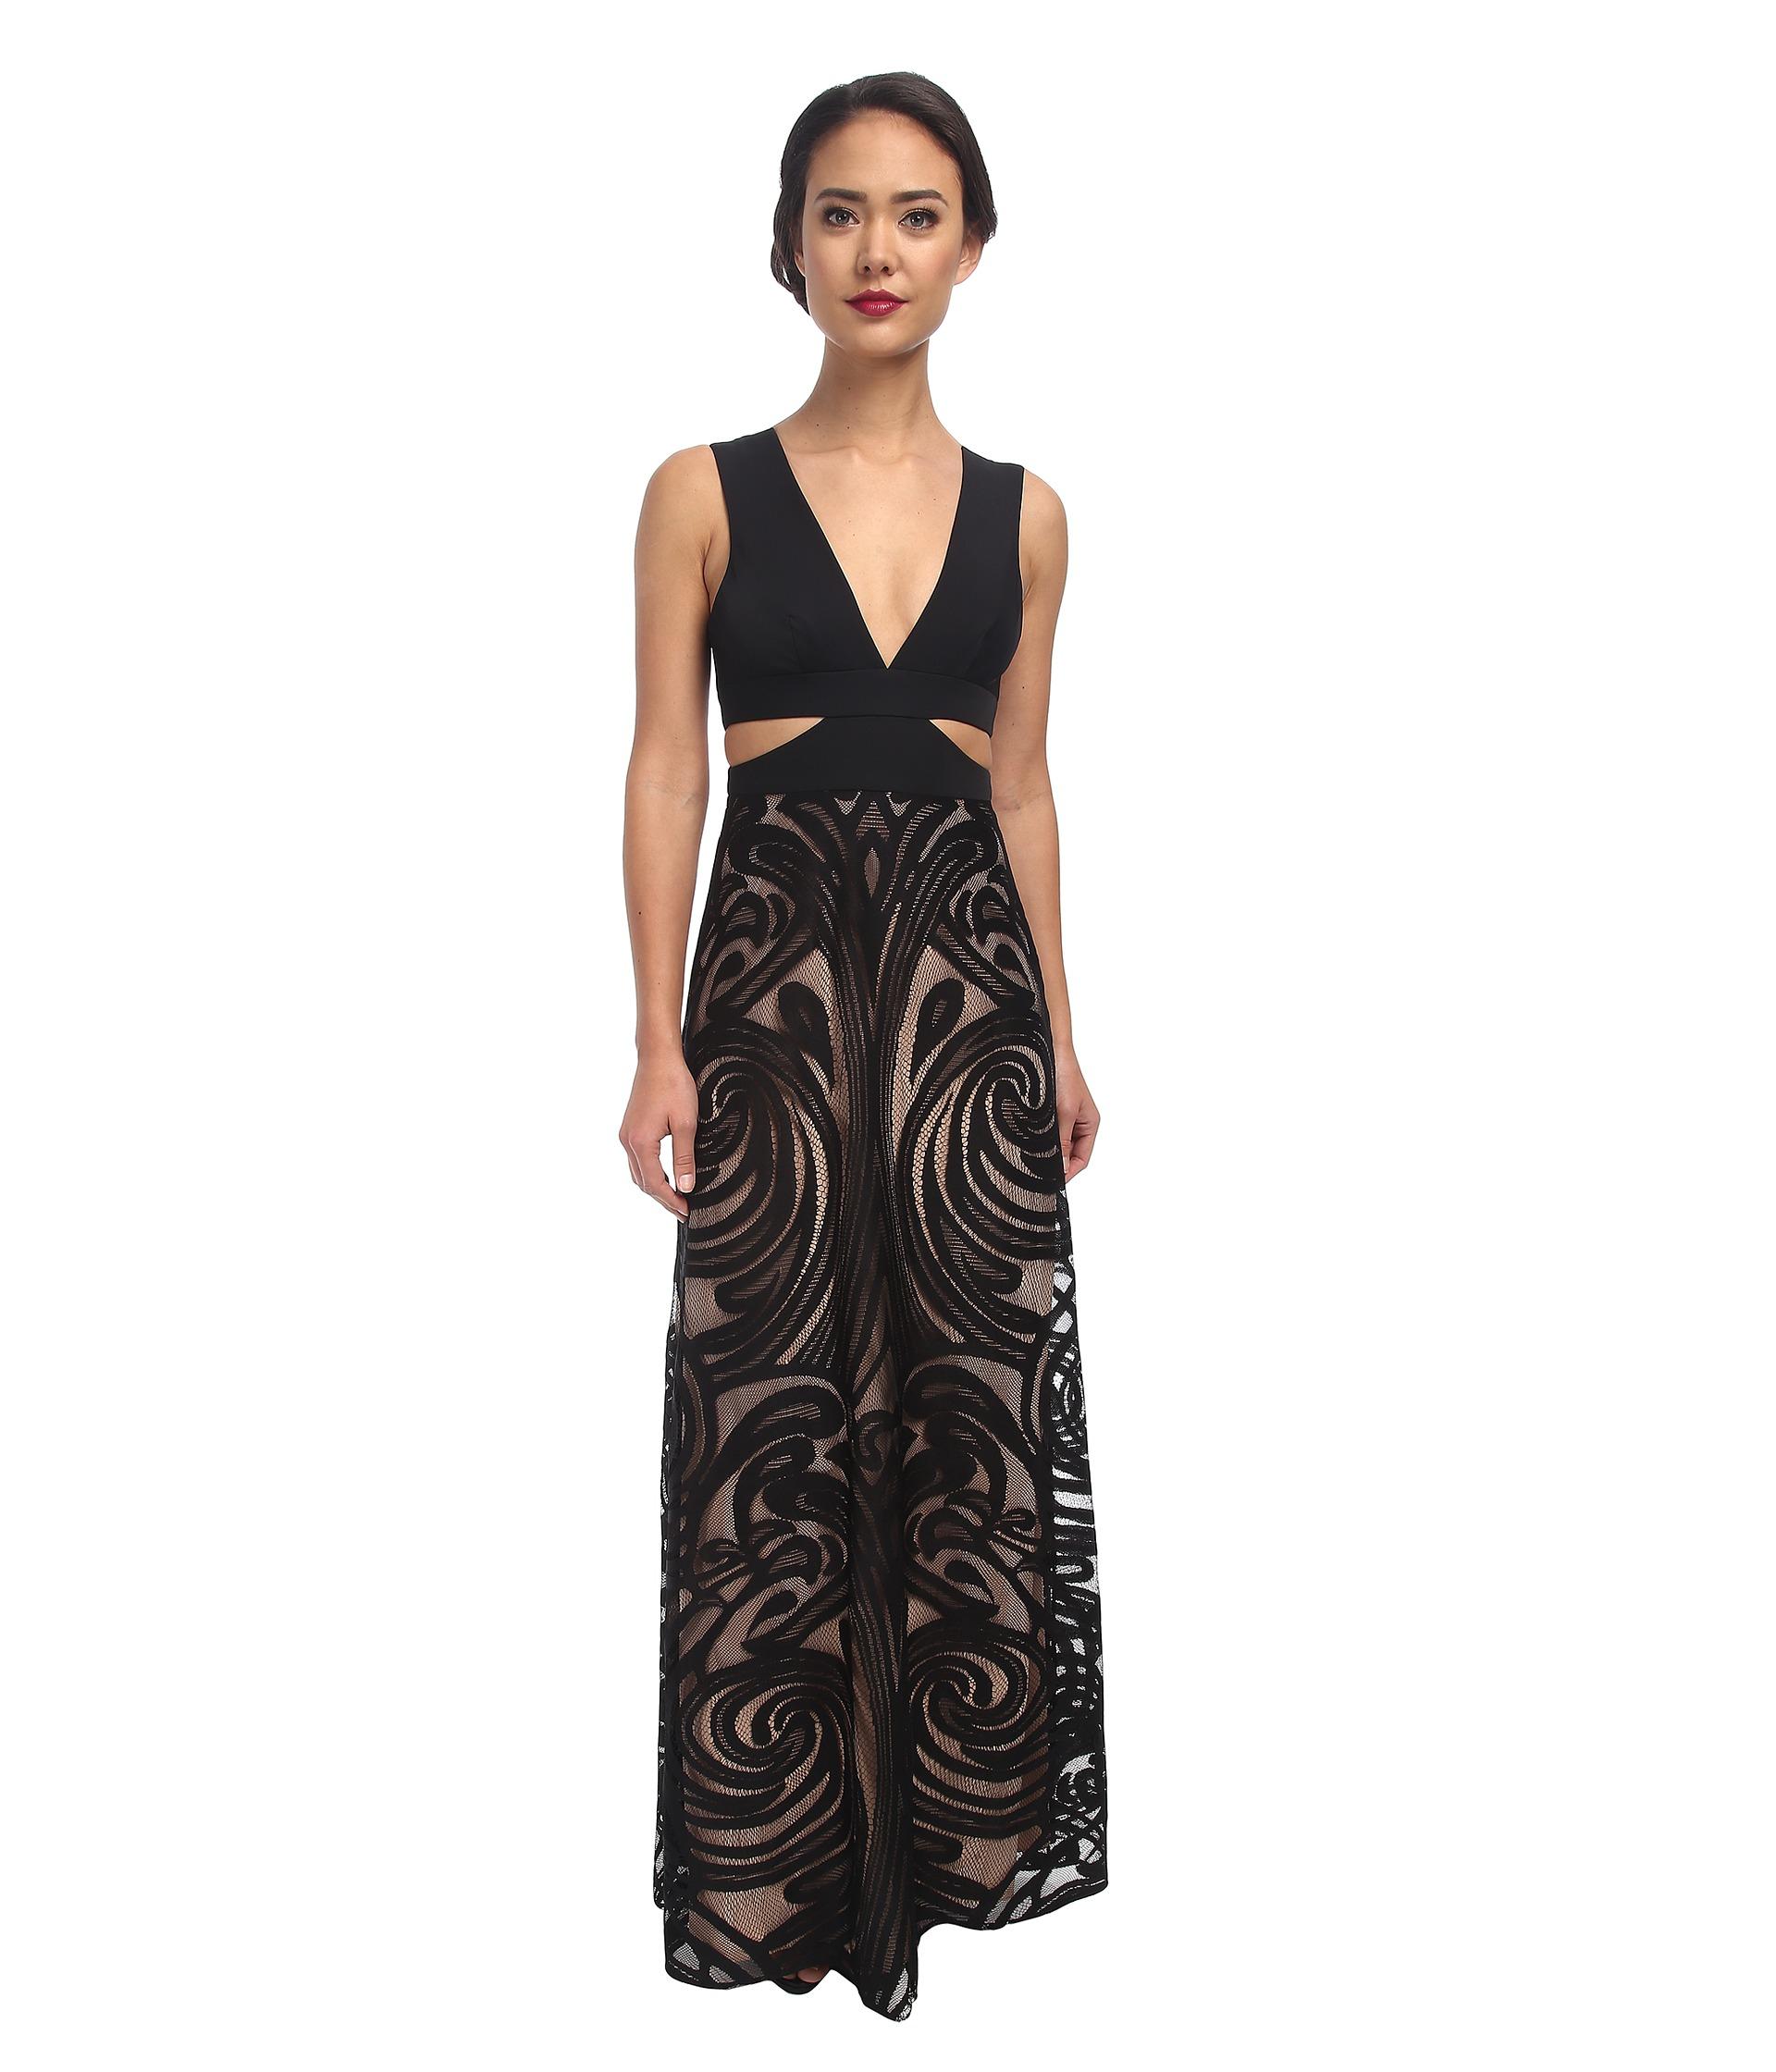 Lyst - Bcbgmaxazria Marilyne Deep V-Neck Dress With Cutout in Black